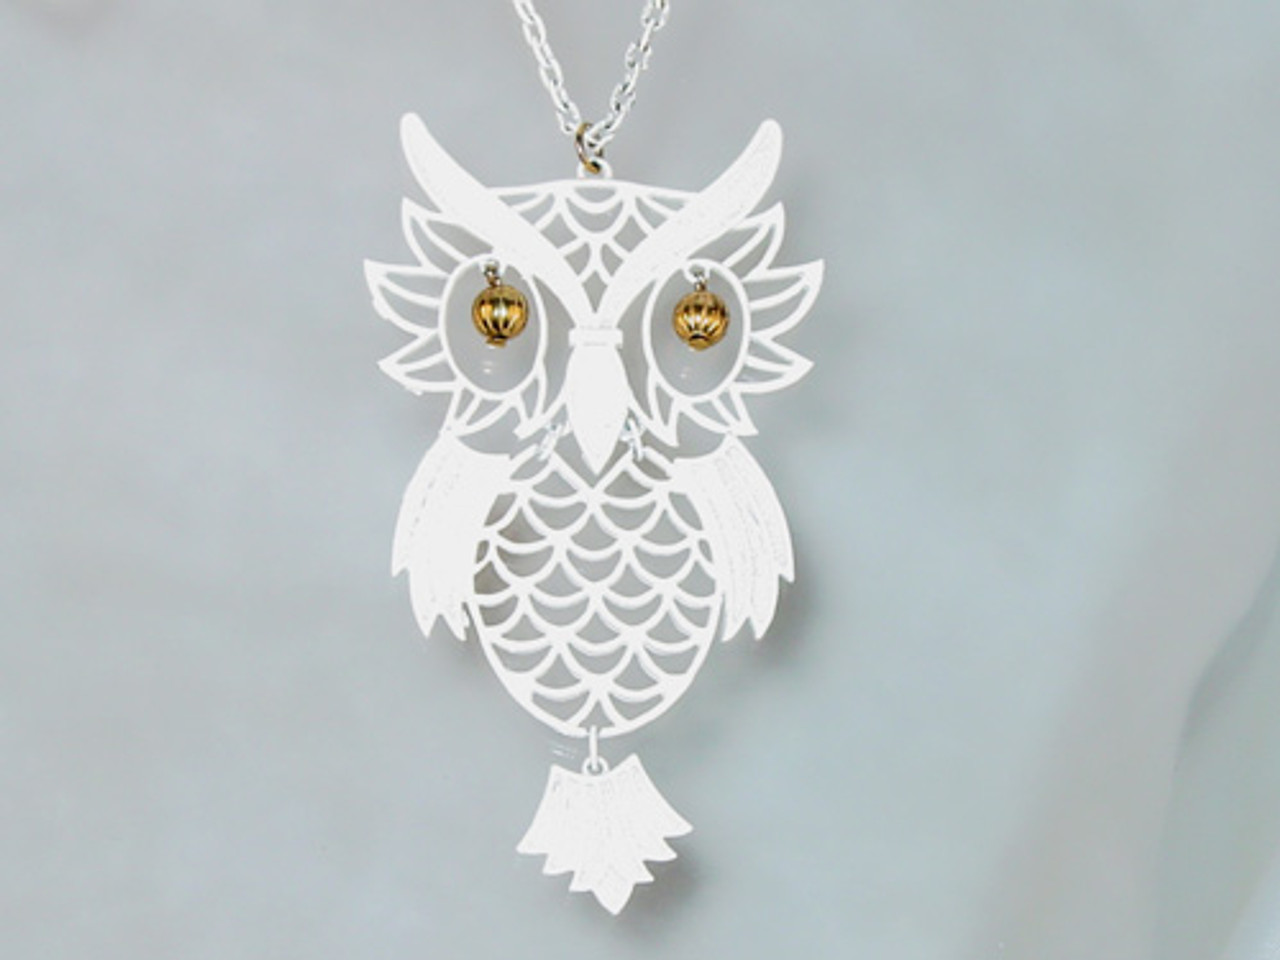 Enamel Owl Pendant Necklace